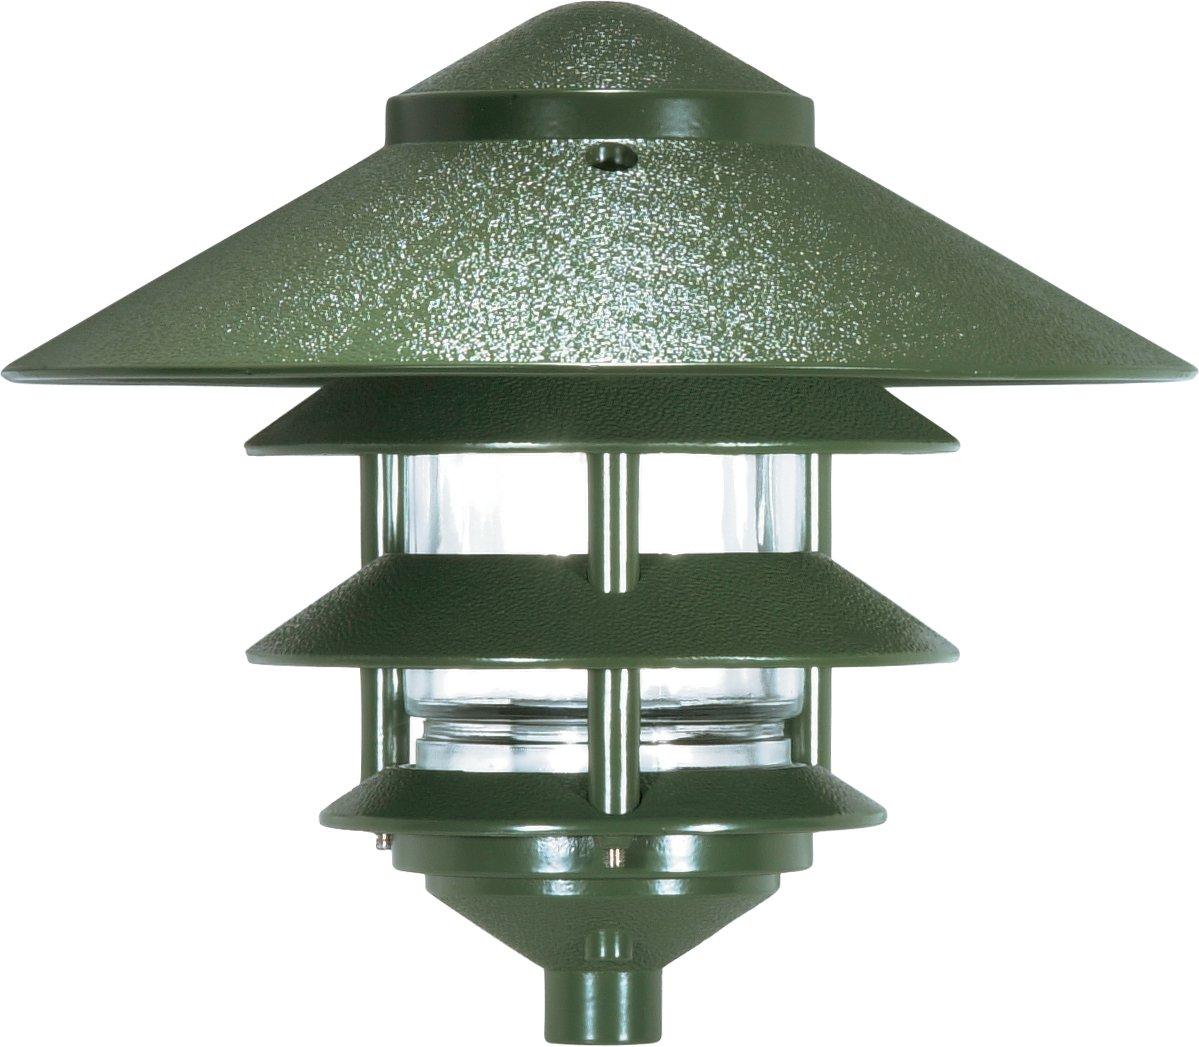 nuvo lighting sf76645 one light par16 120 volt die cast aluminum durable outdoor landscape security lighting flood dark bronze flood lighting amazon - Volt Landscape Lighting